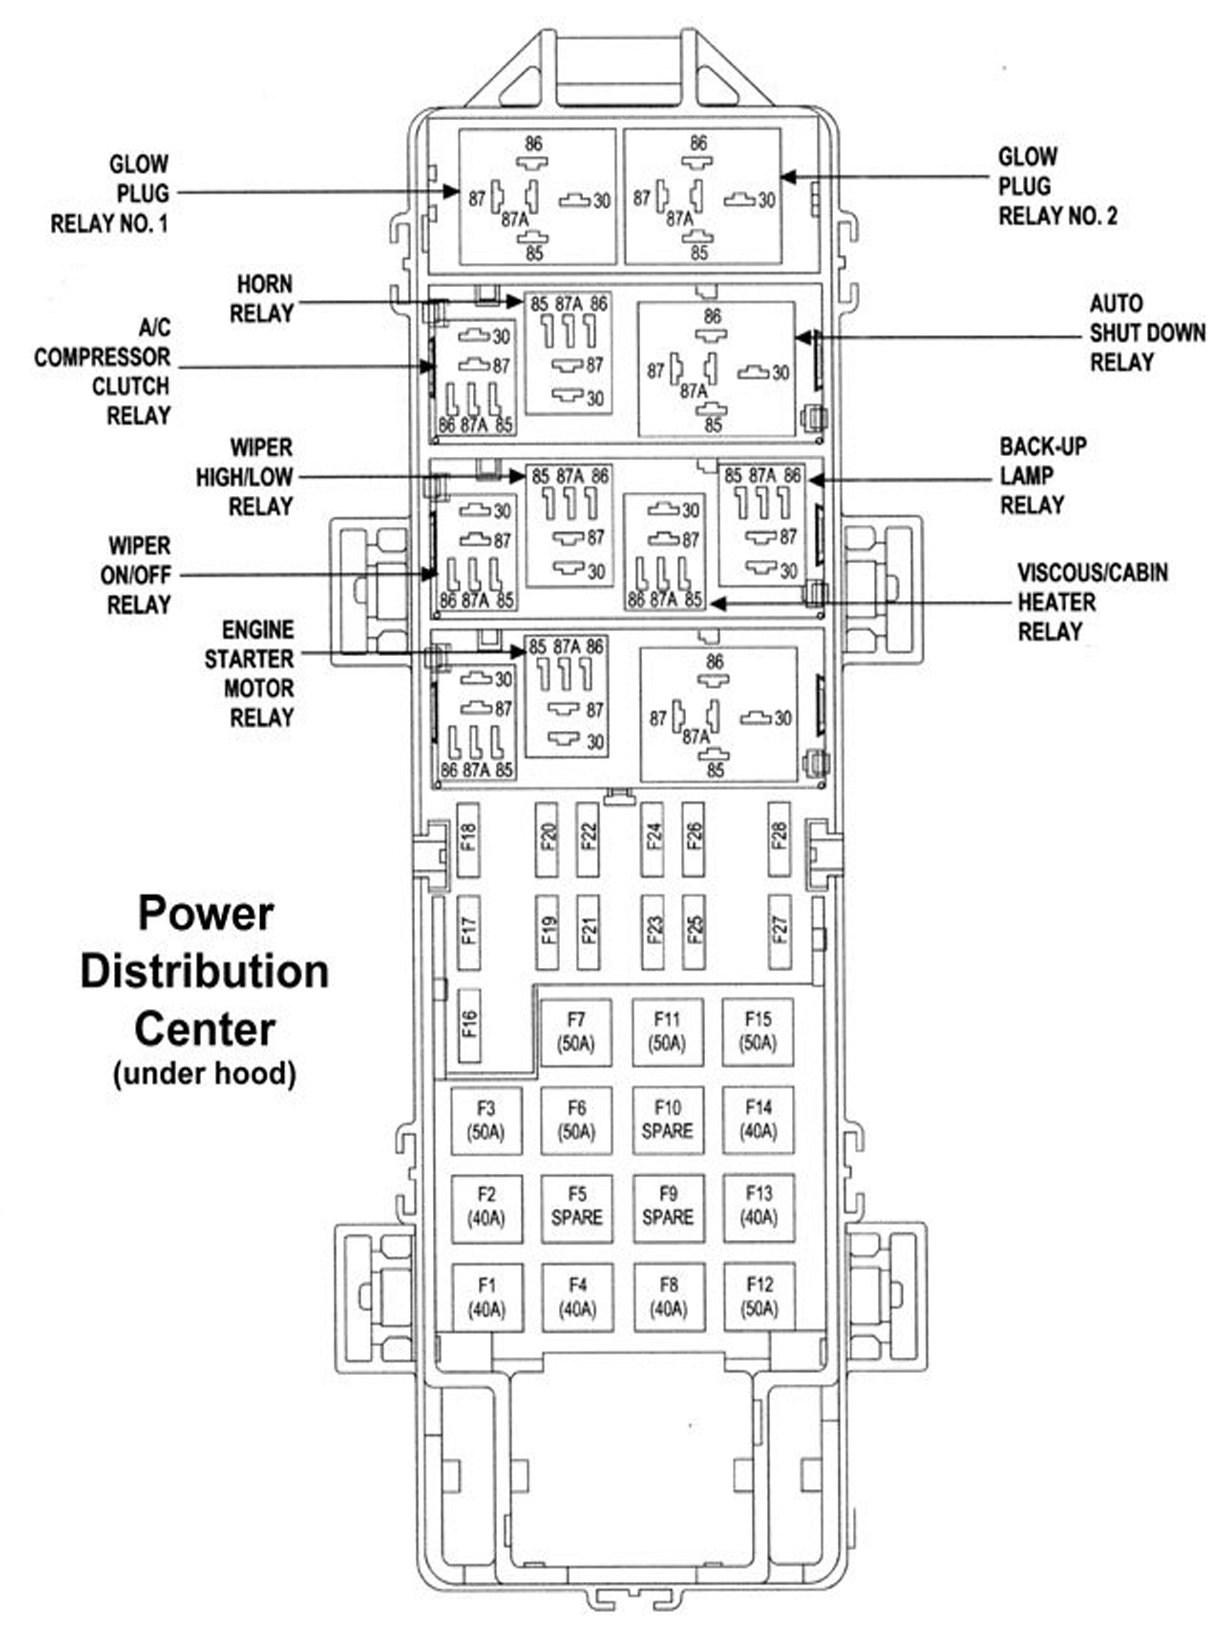 ES_9499] Jeep Cherokee Fuse Box Diagram Get Free Image About Wiring Diagram  Download DiagramElec Gritea Mohammedshrine Librar Wiring 101